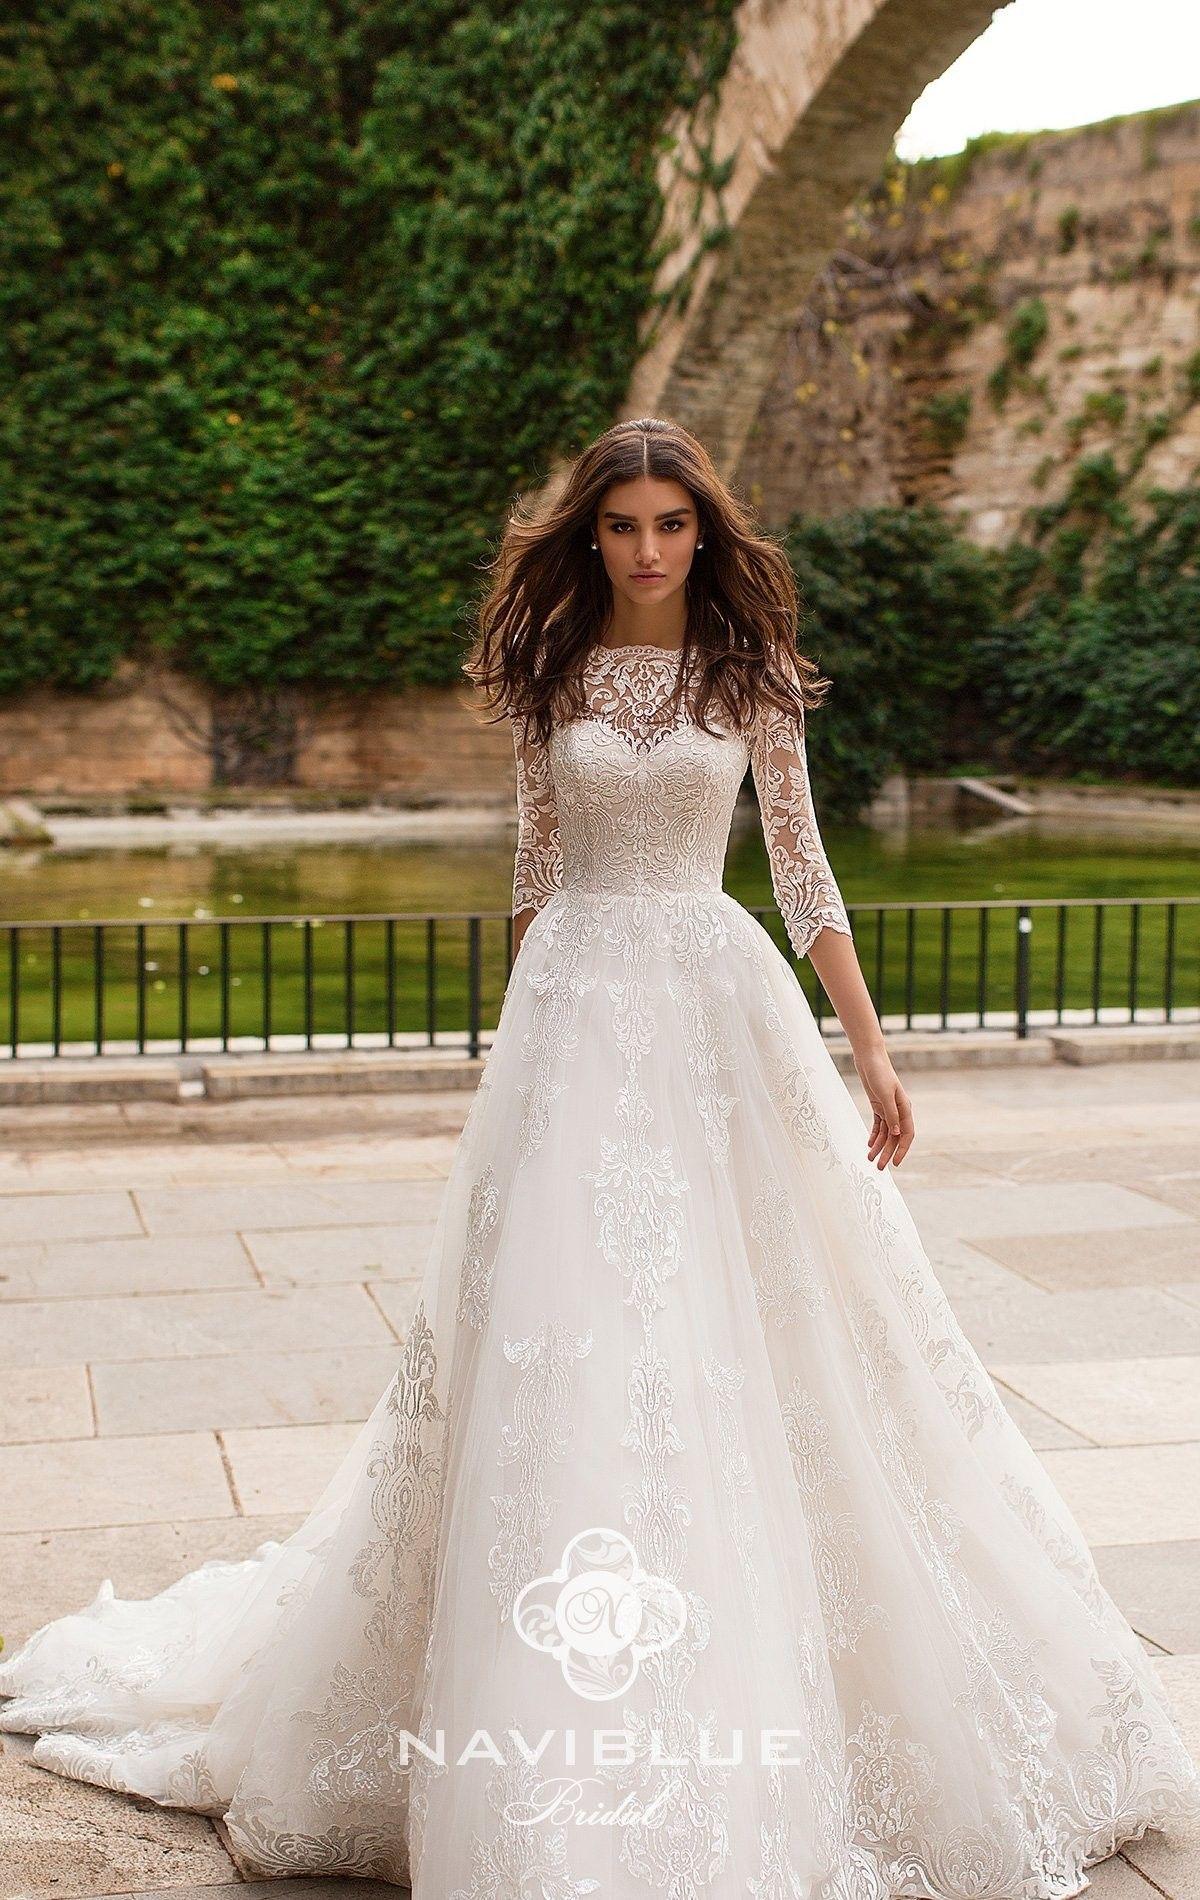 232c02c314fa Pin by רחל בן-סימון on שמלות | Pinterest | Свадьба, Свадебный and Свадьба  мечты